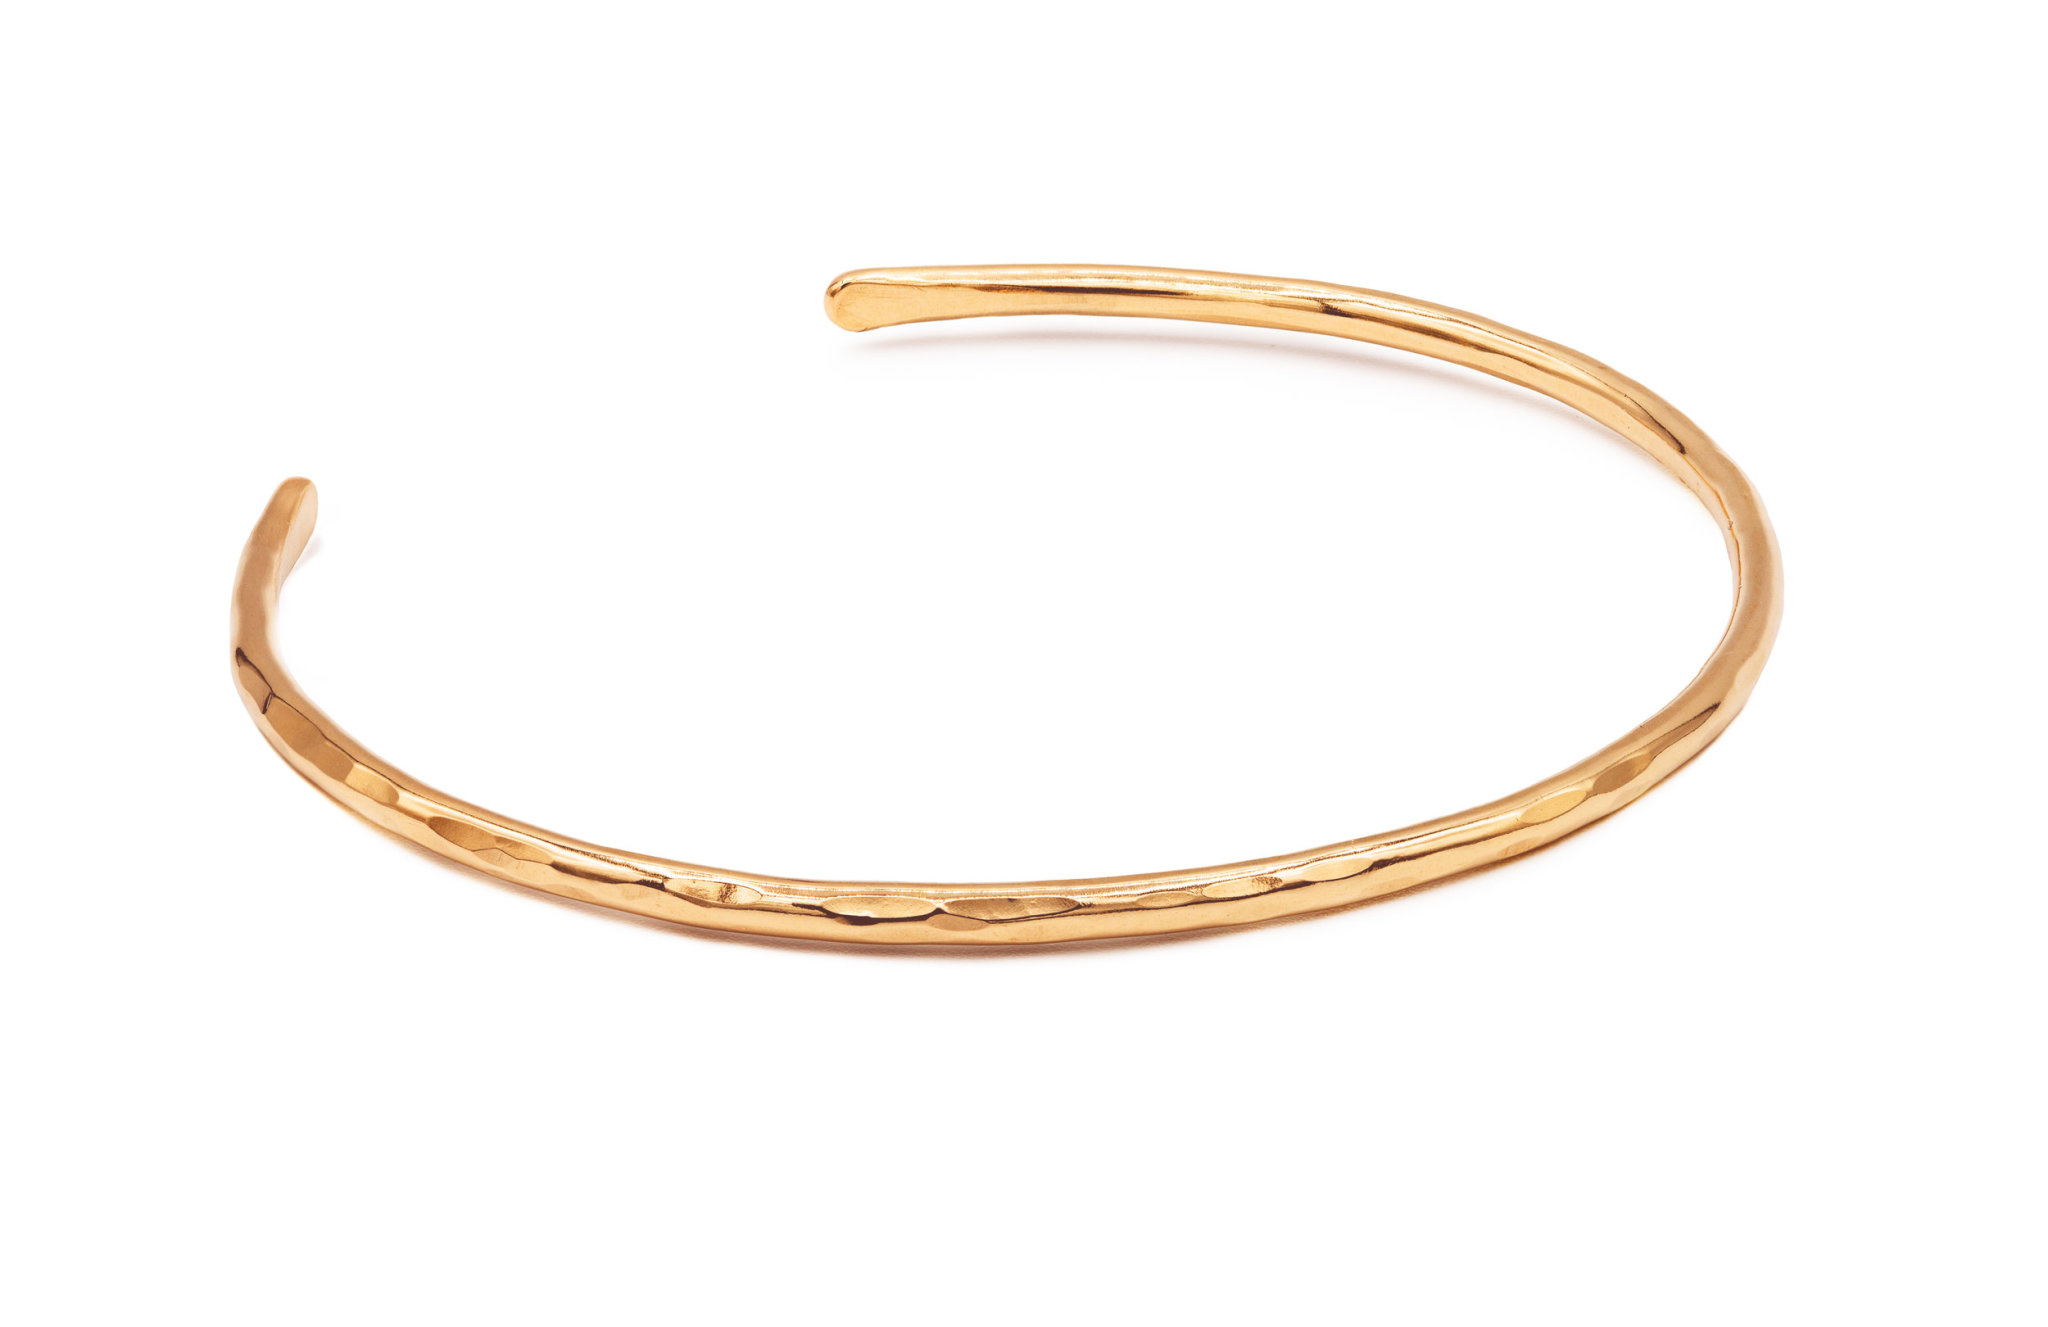 Mana Made Jewelry Mana Made Thin Cuff Bracelet 14K